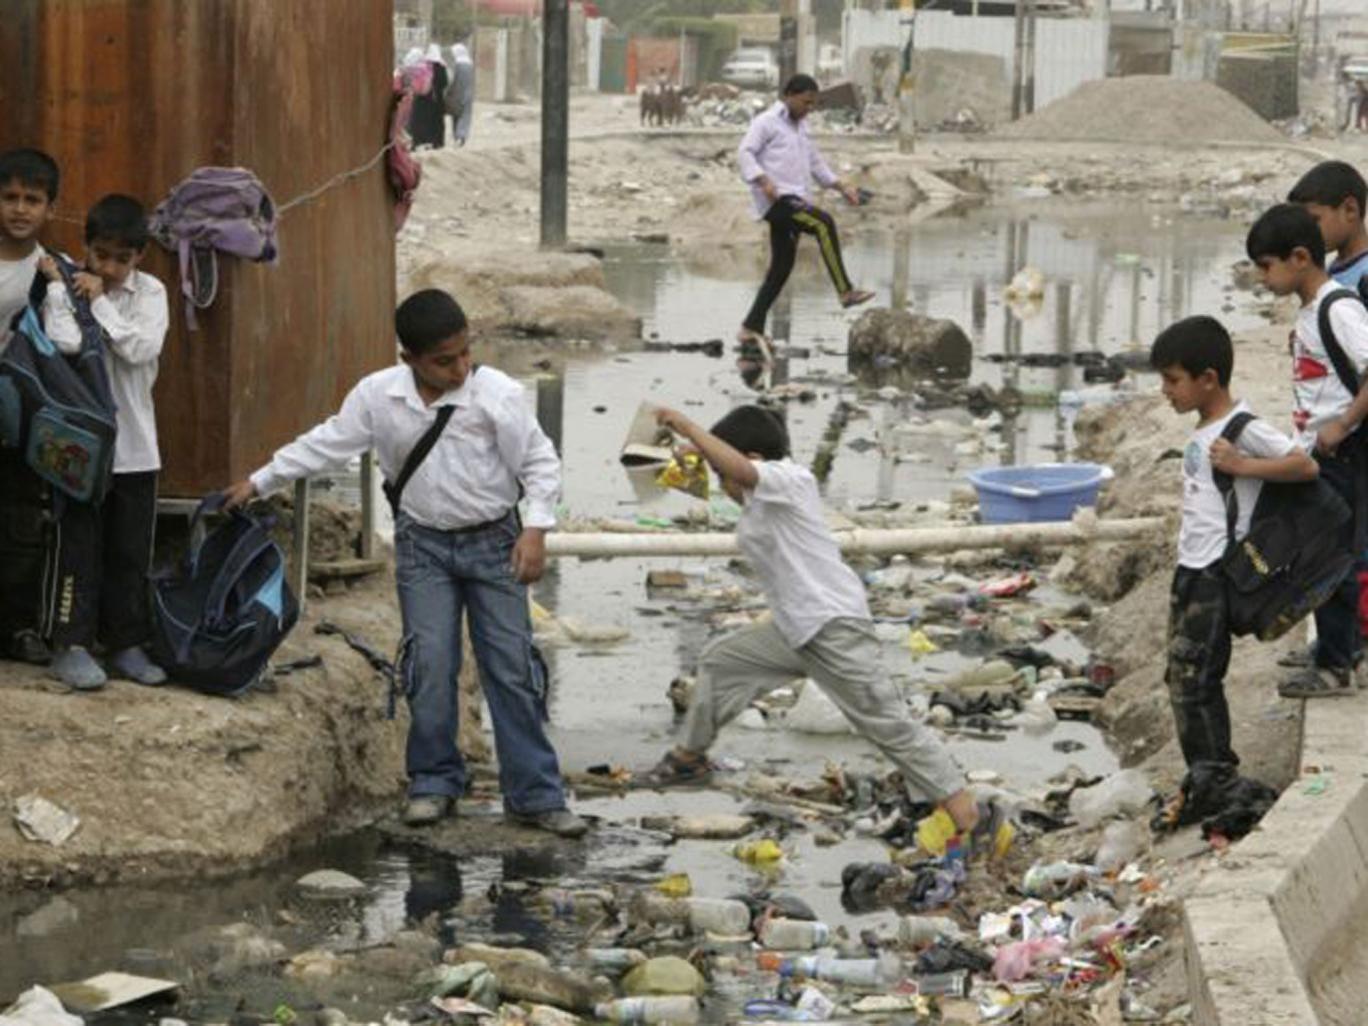 Students cross a sewage canal at Baghdad's Sadr city